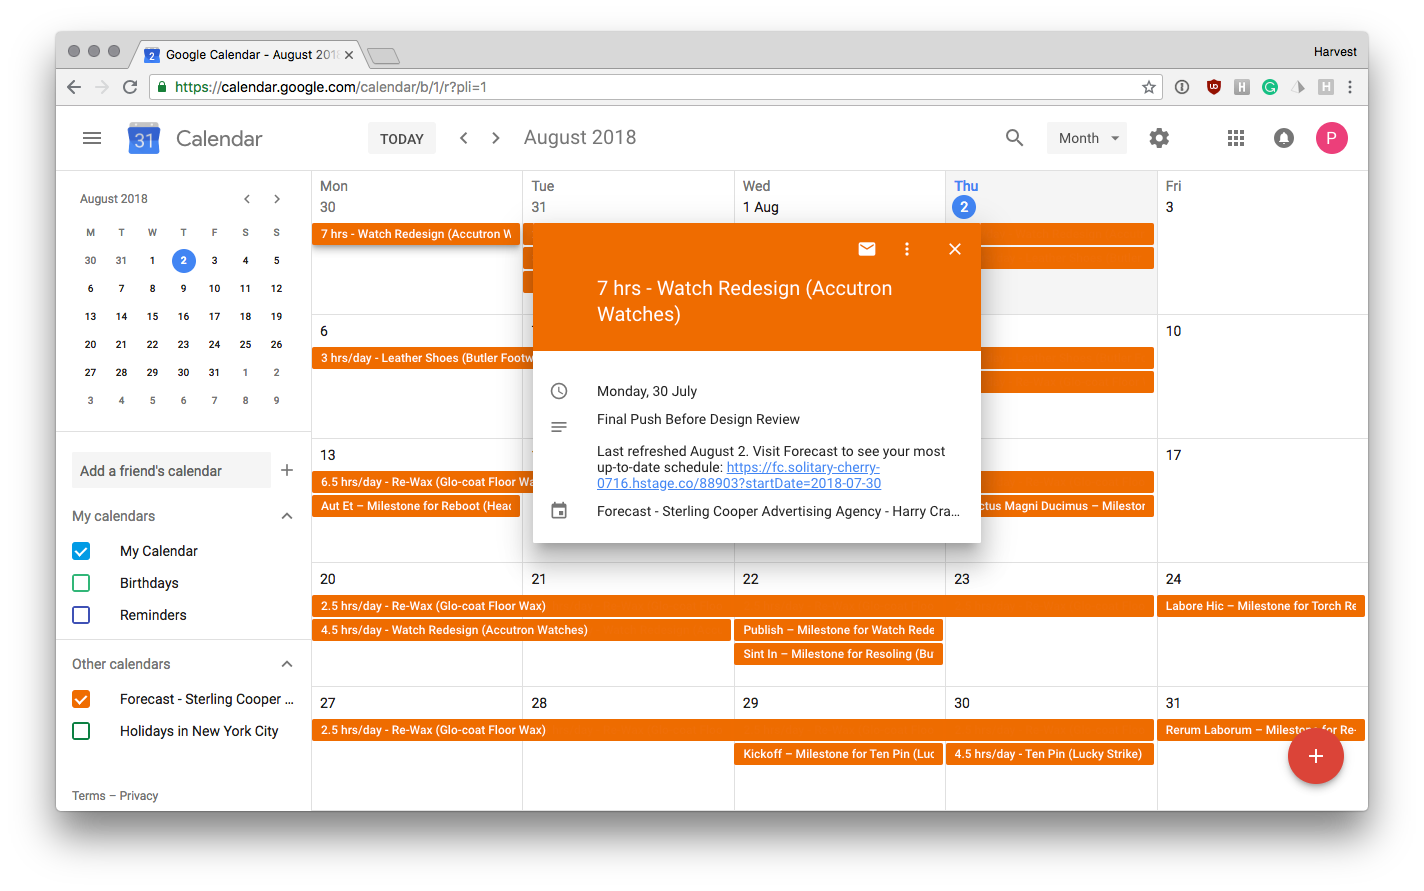 Google Calendar with Forecast Schedule